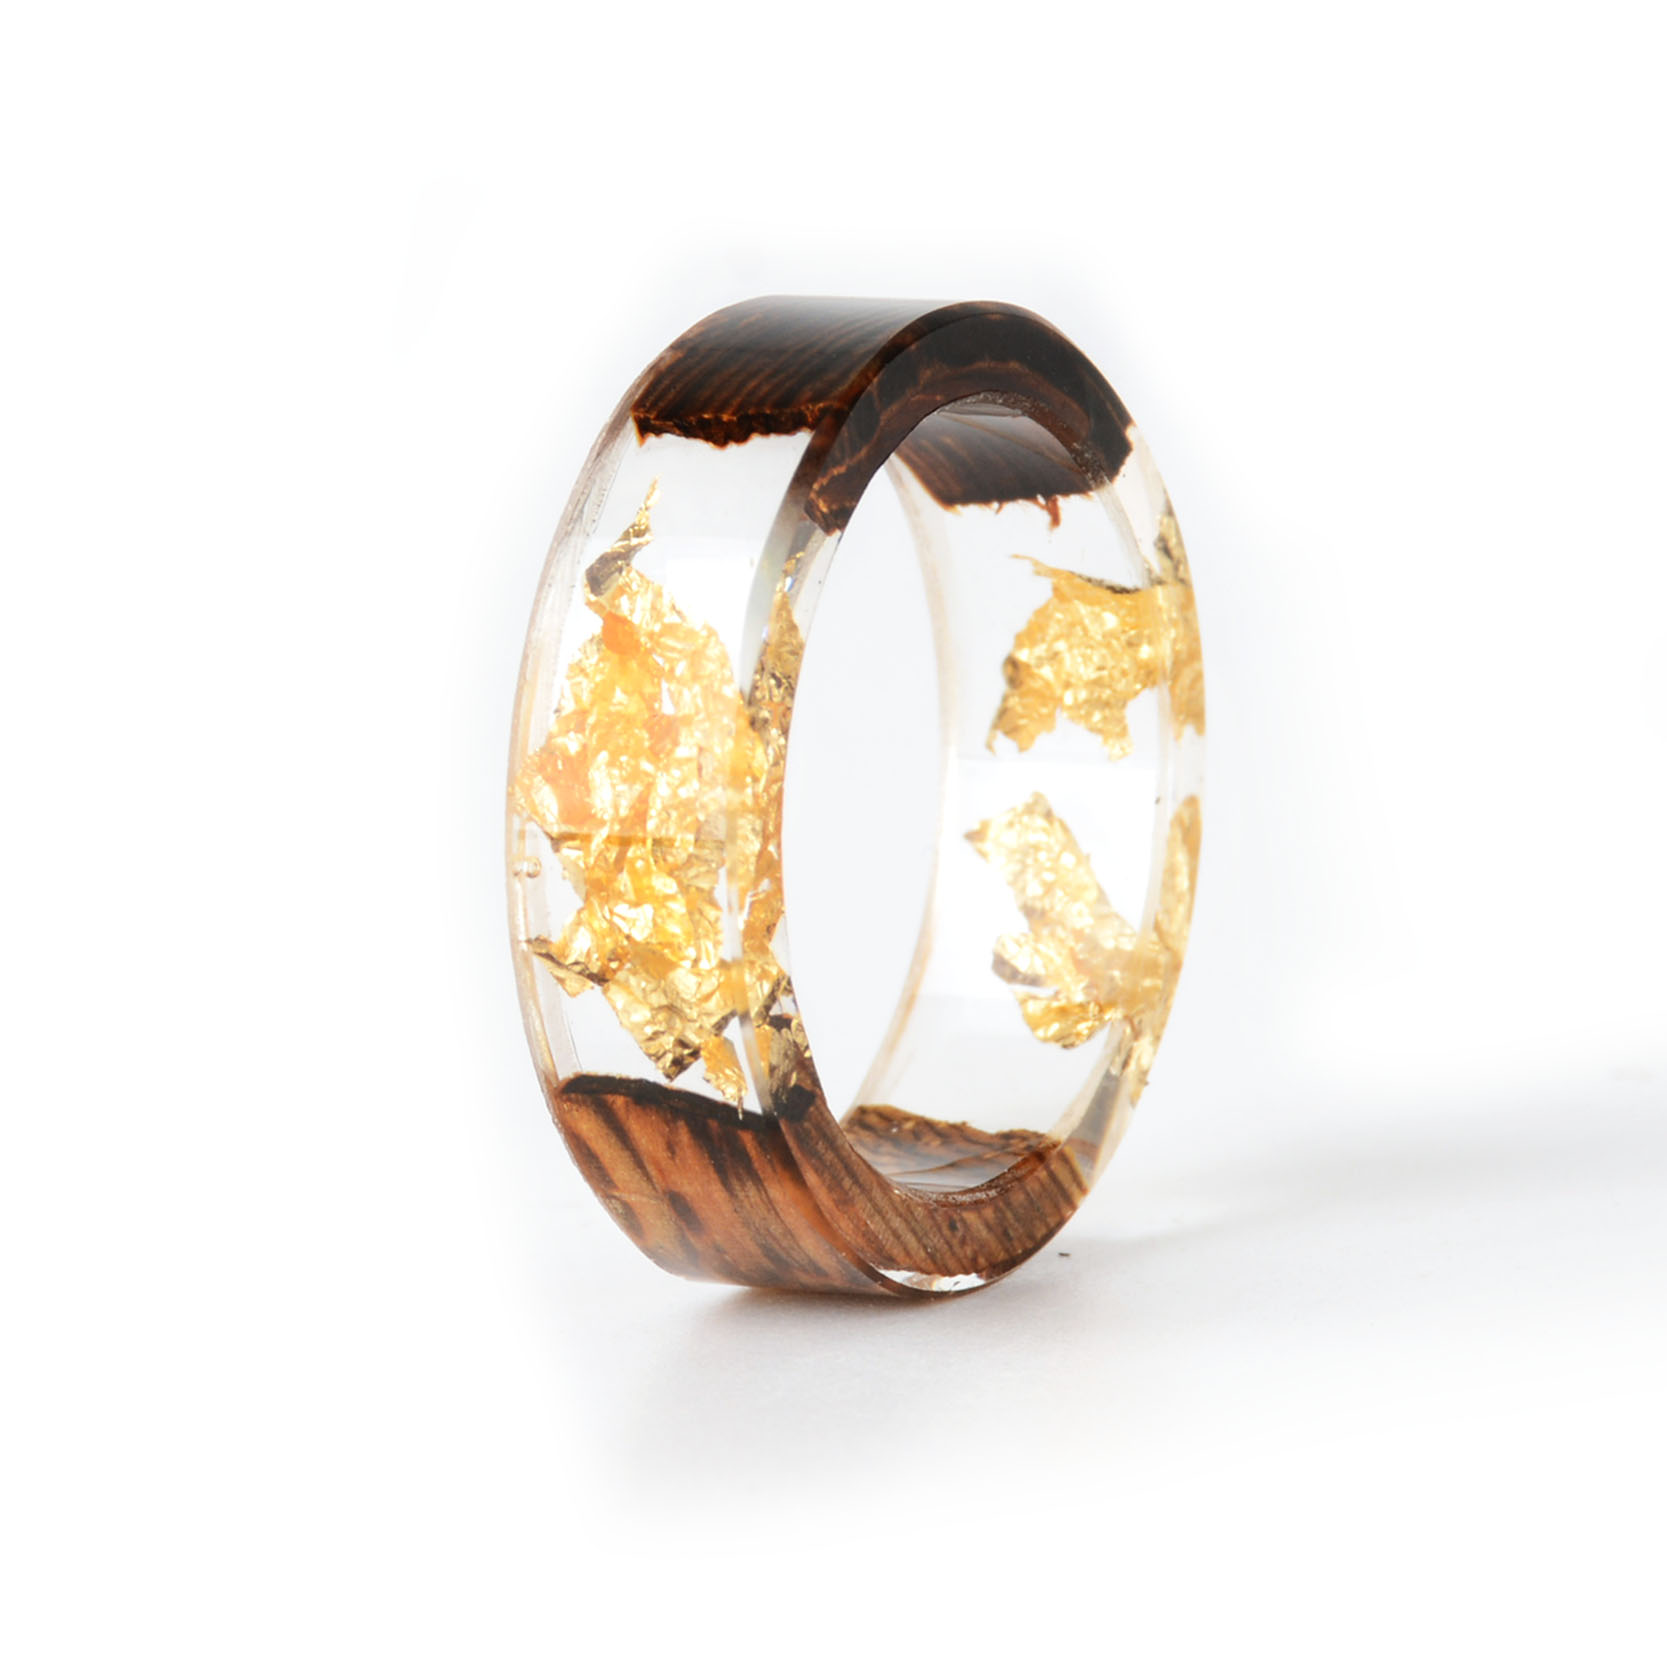 Handmade Wood Resin Ring Many Styles 24